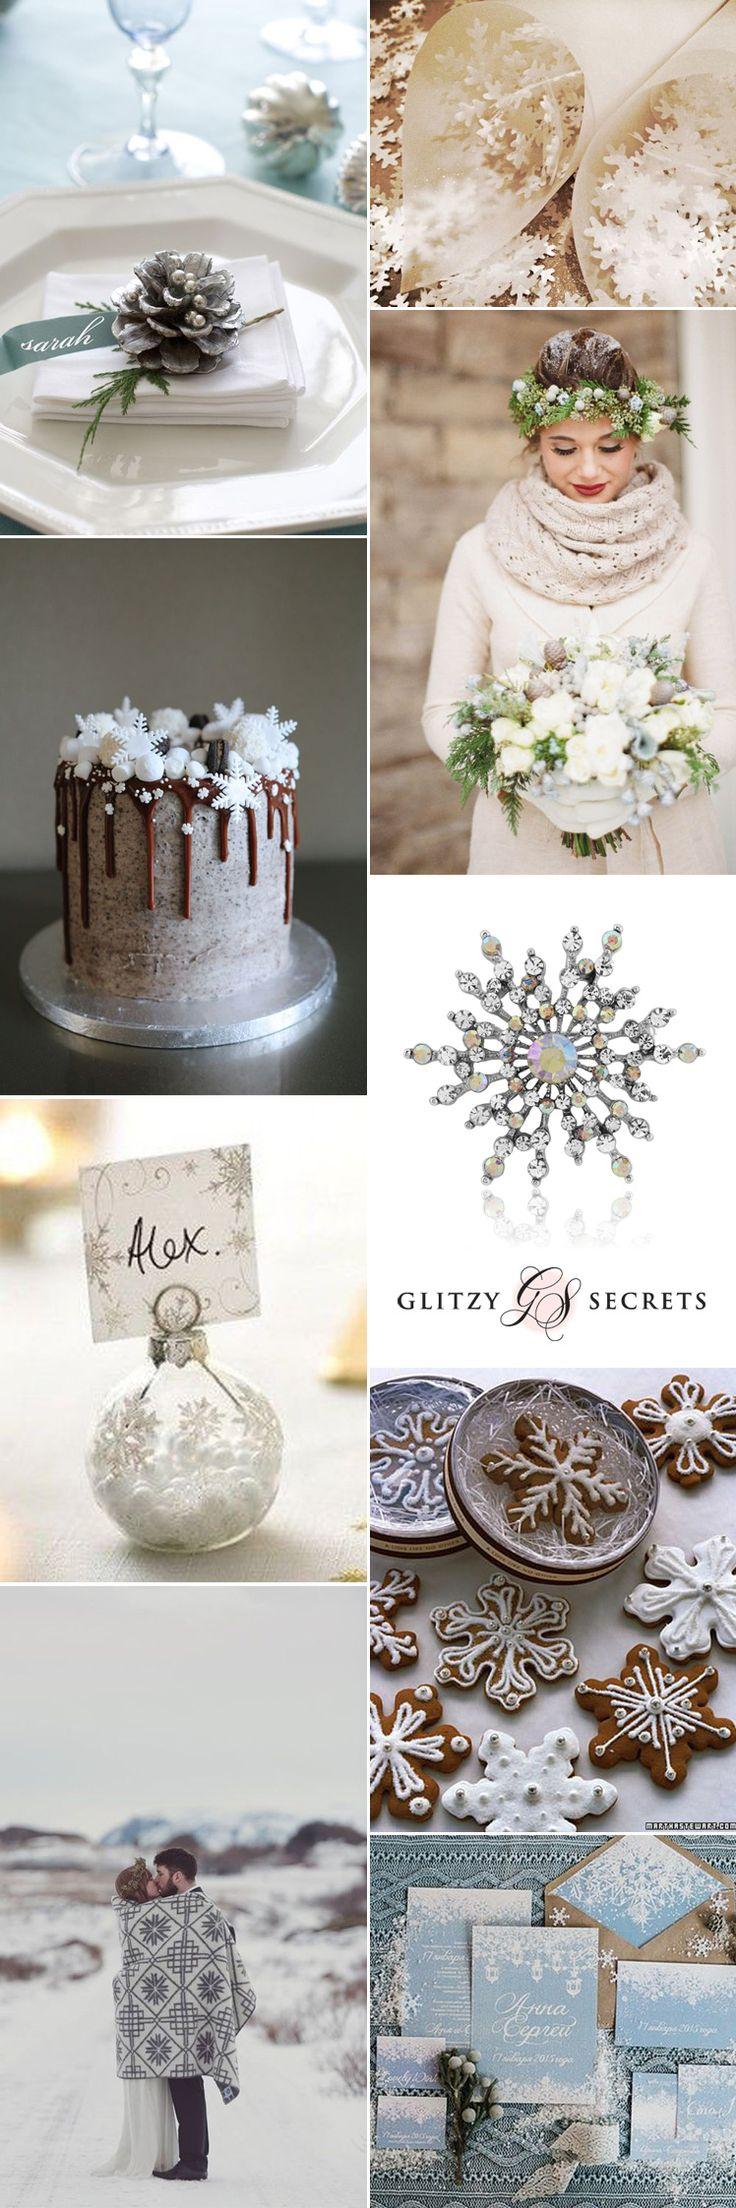 Beautiful snowflake wedding ideas on GS Inspiration - Glitzy Secrets